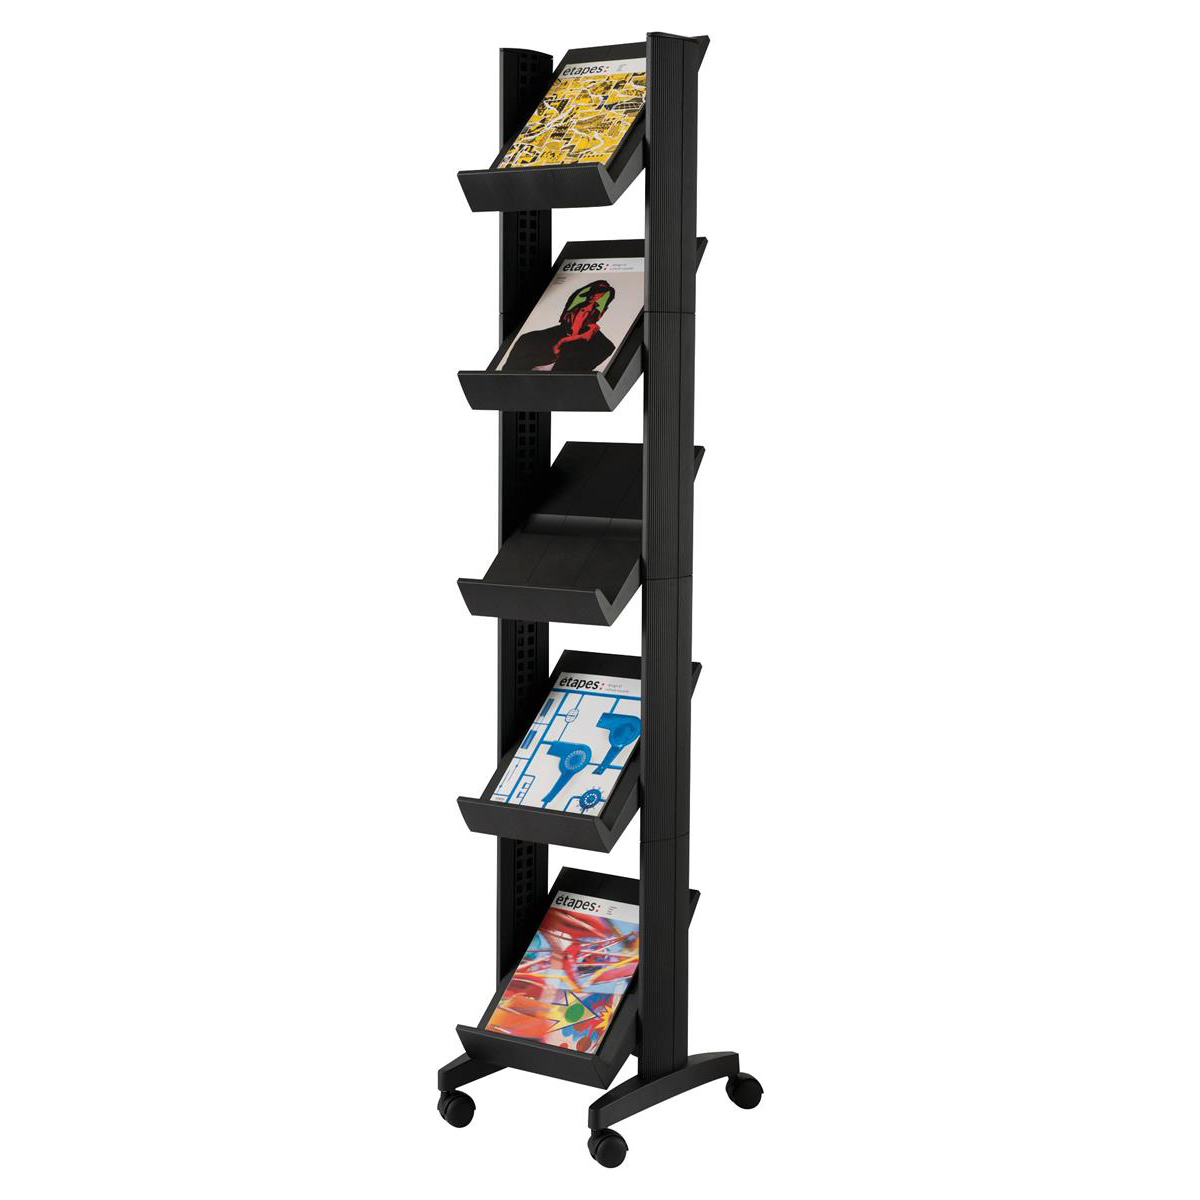 Literature Holders Fast Paper Literature Display Corner Mobile 5 Shelves 35mm Lip Black Ref 259N.01